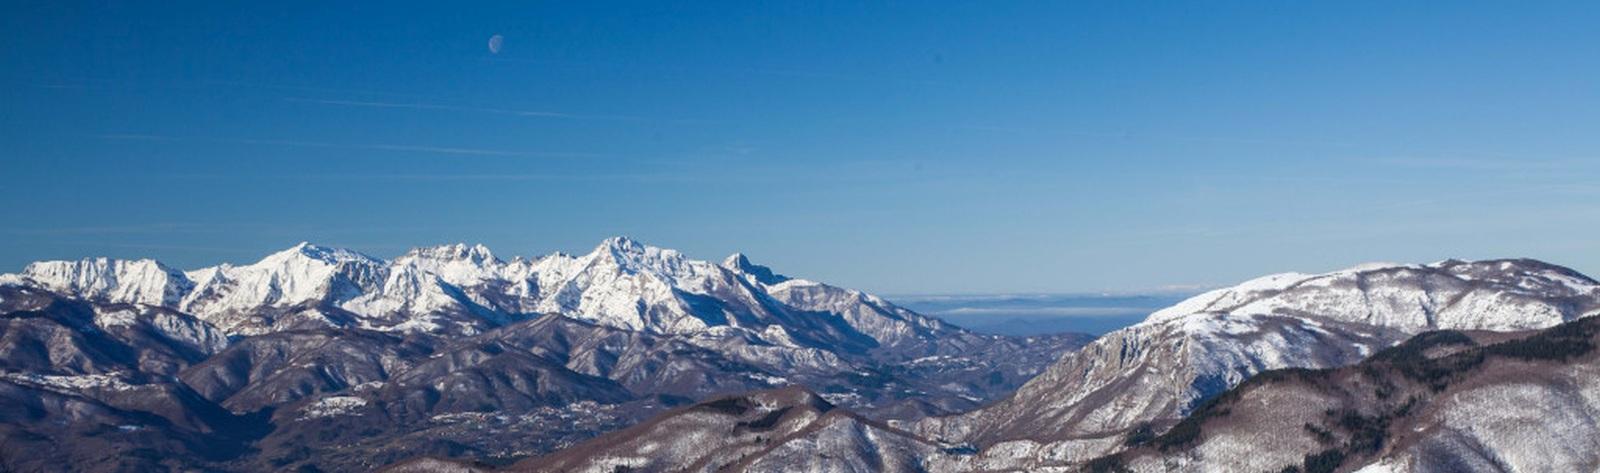 Tappa N.8B :  Variante Gazzano – San Pellegrino in Alpe (17.6 KM)